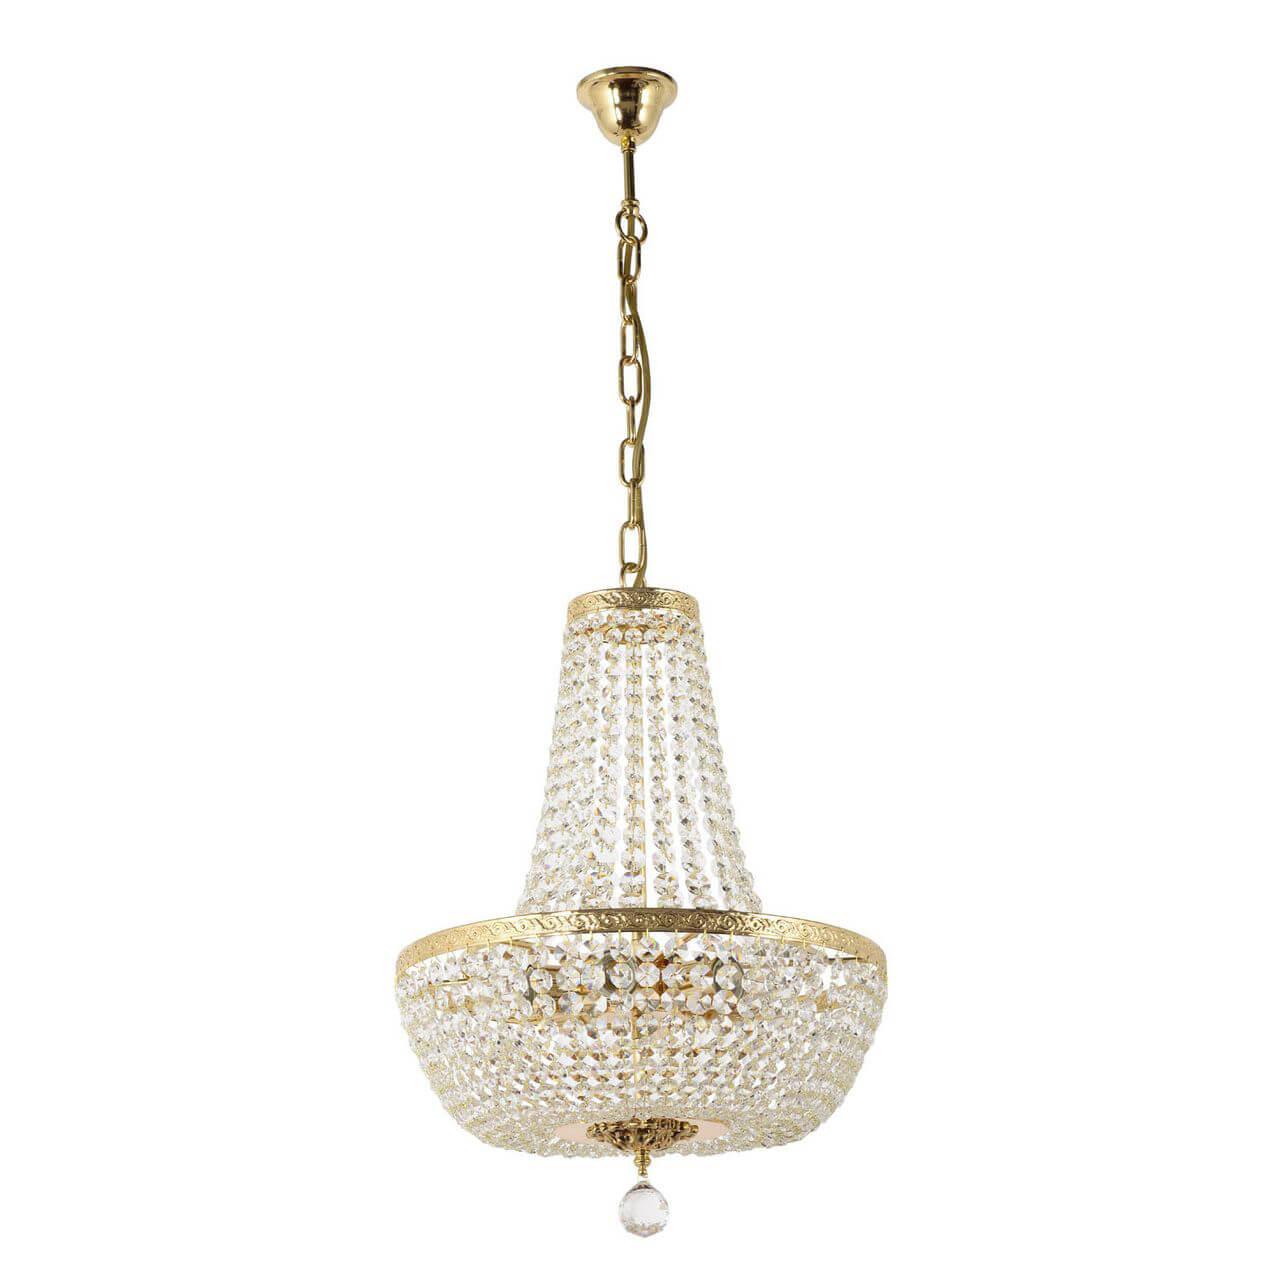 Arti Lampadari Castellana E 1.5.40